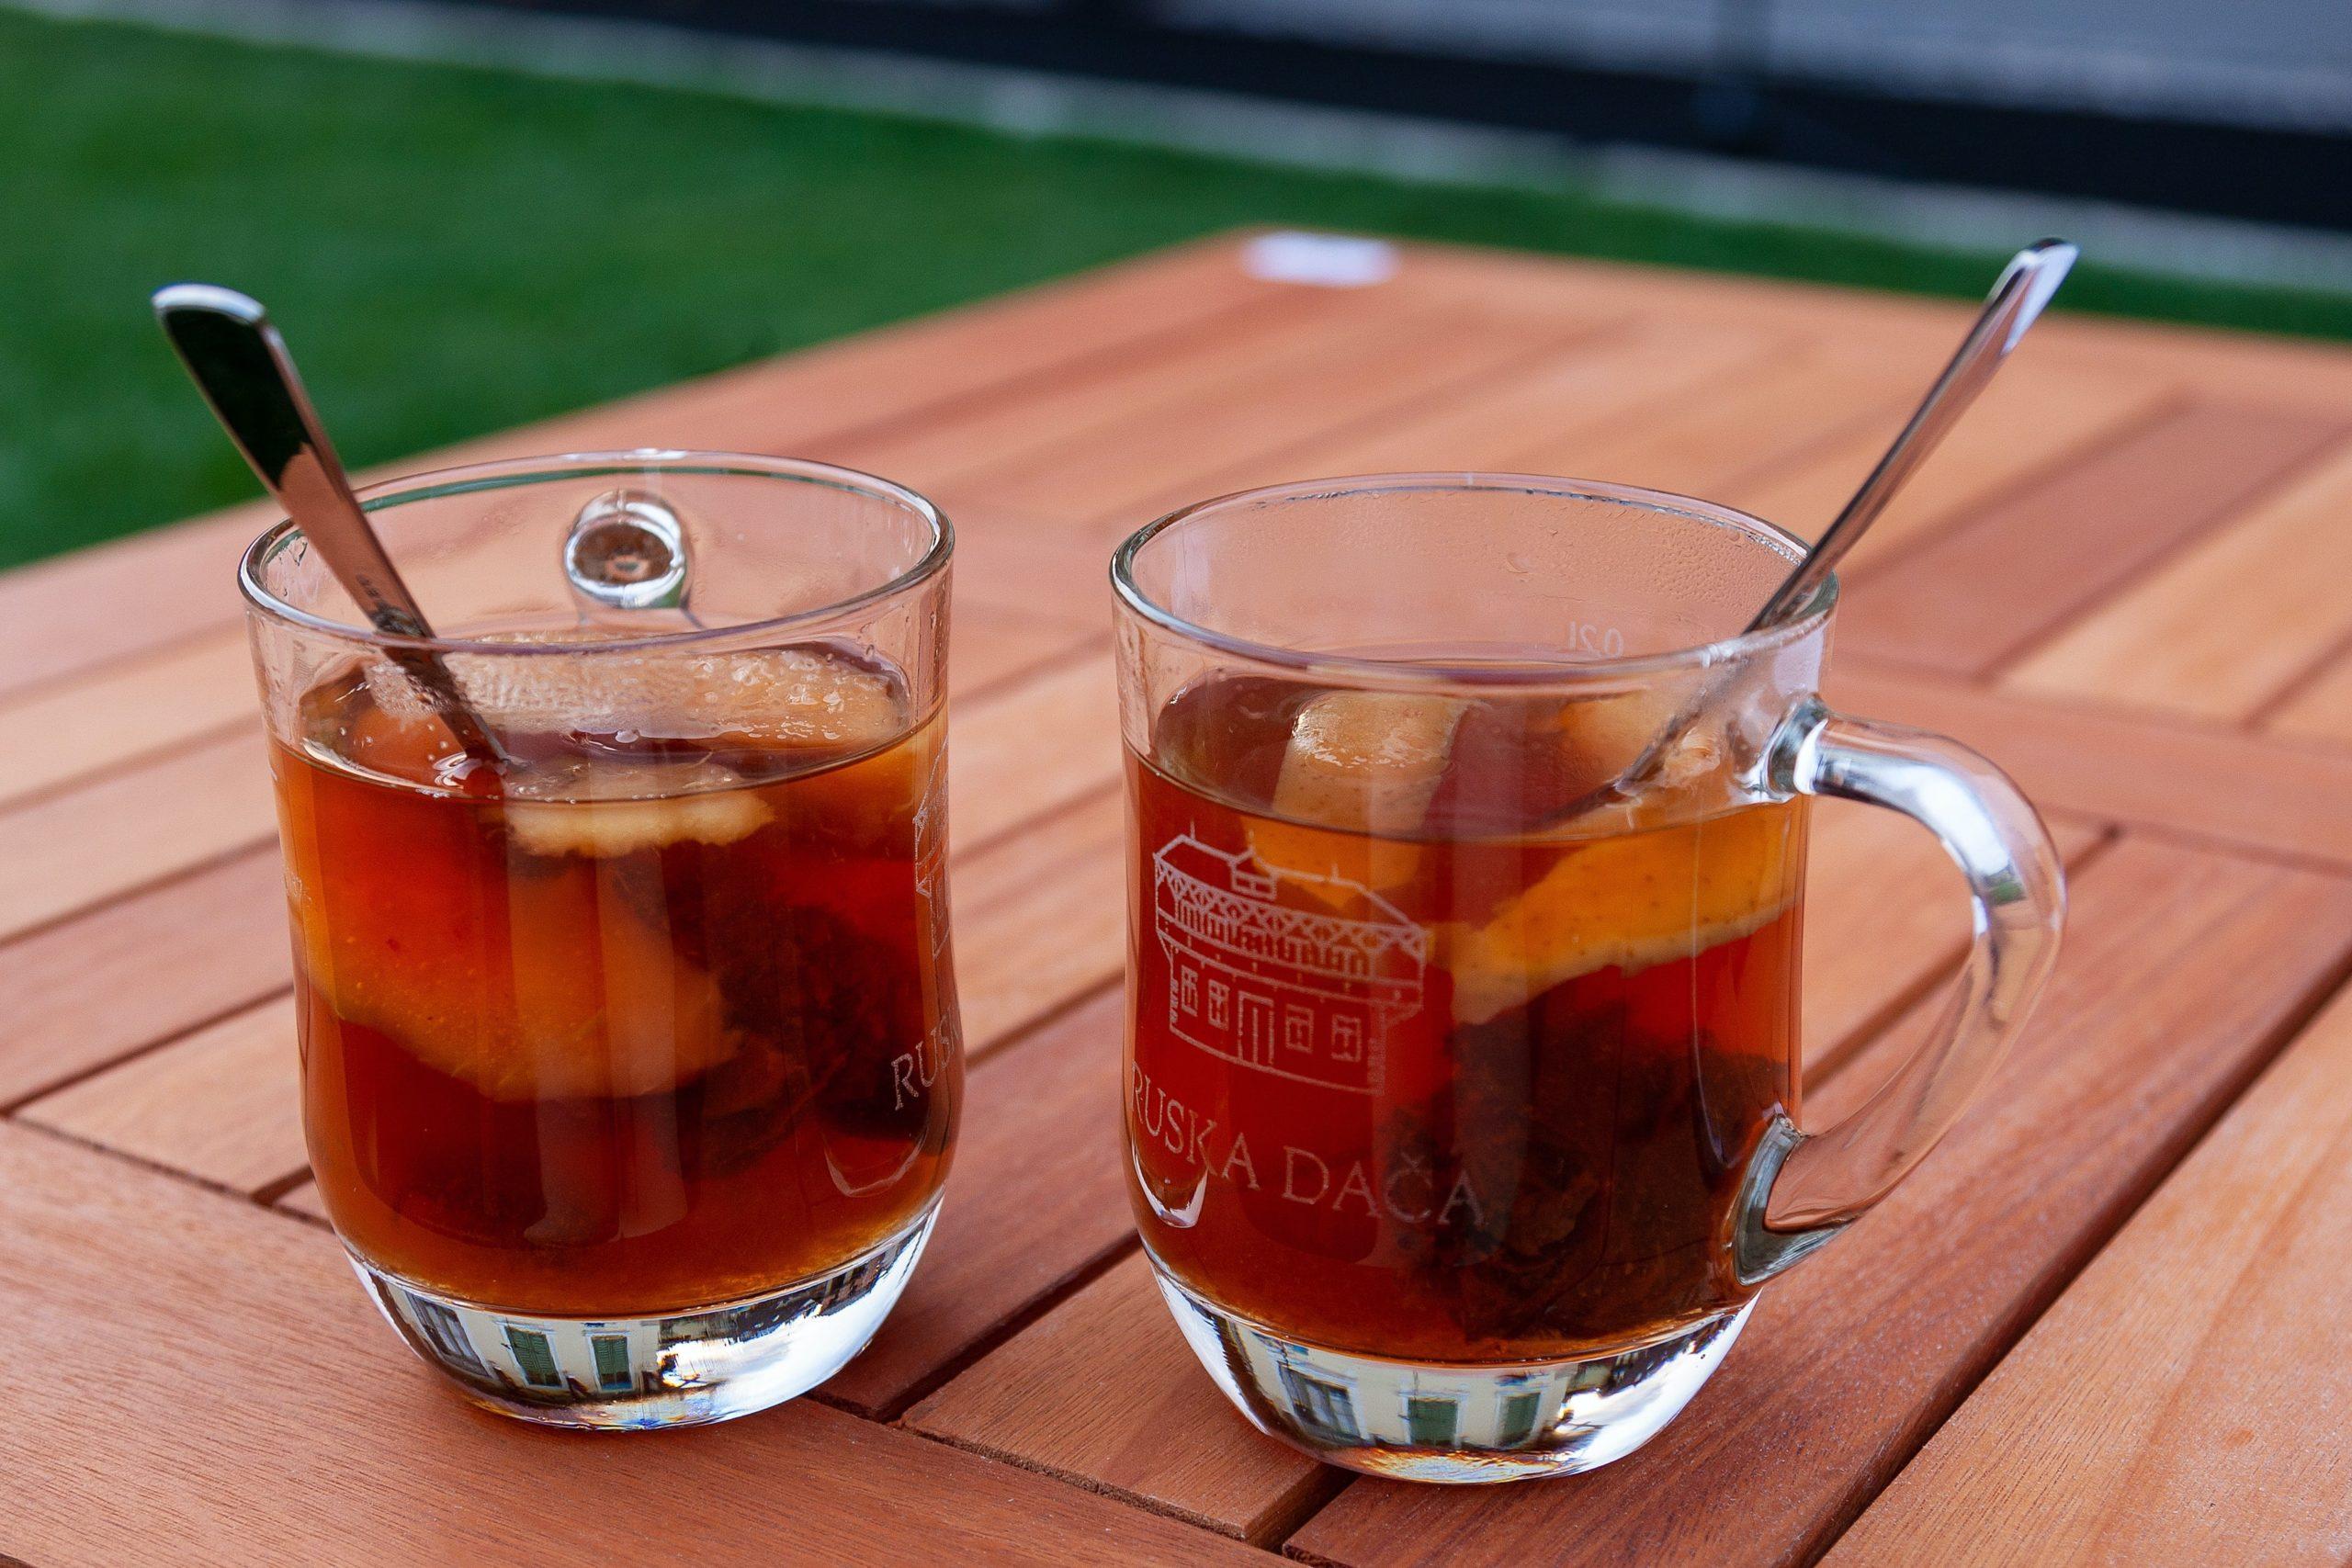 Две кружки с чаем